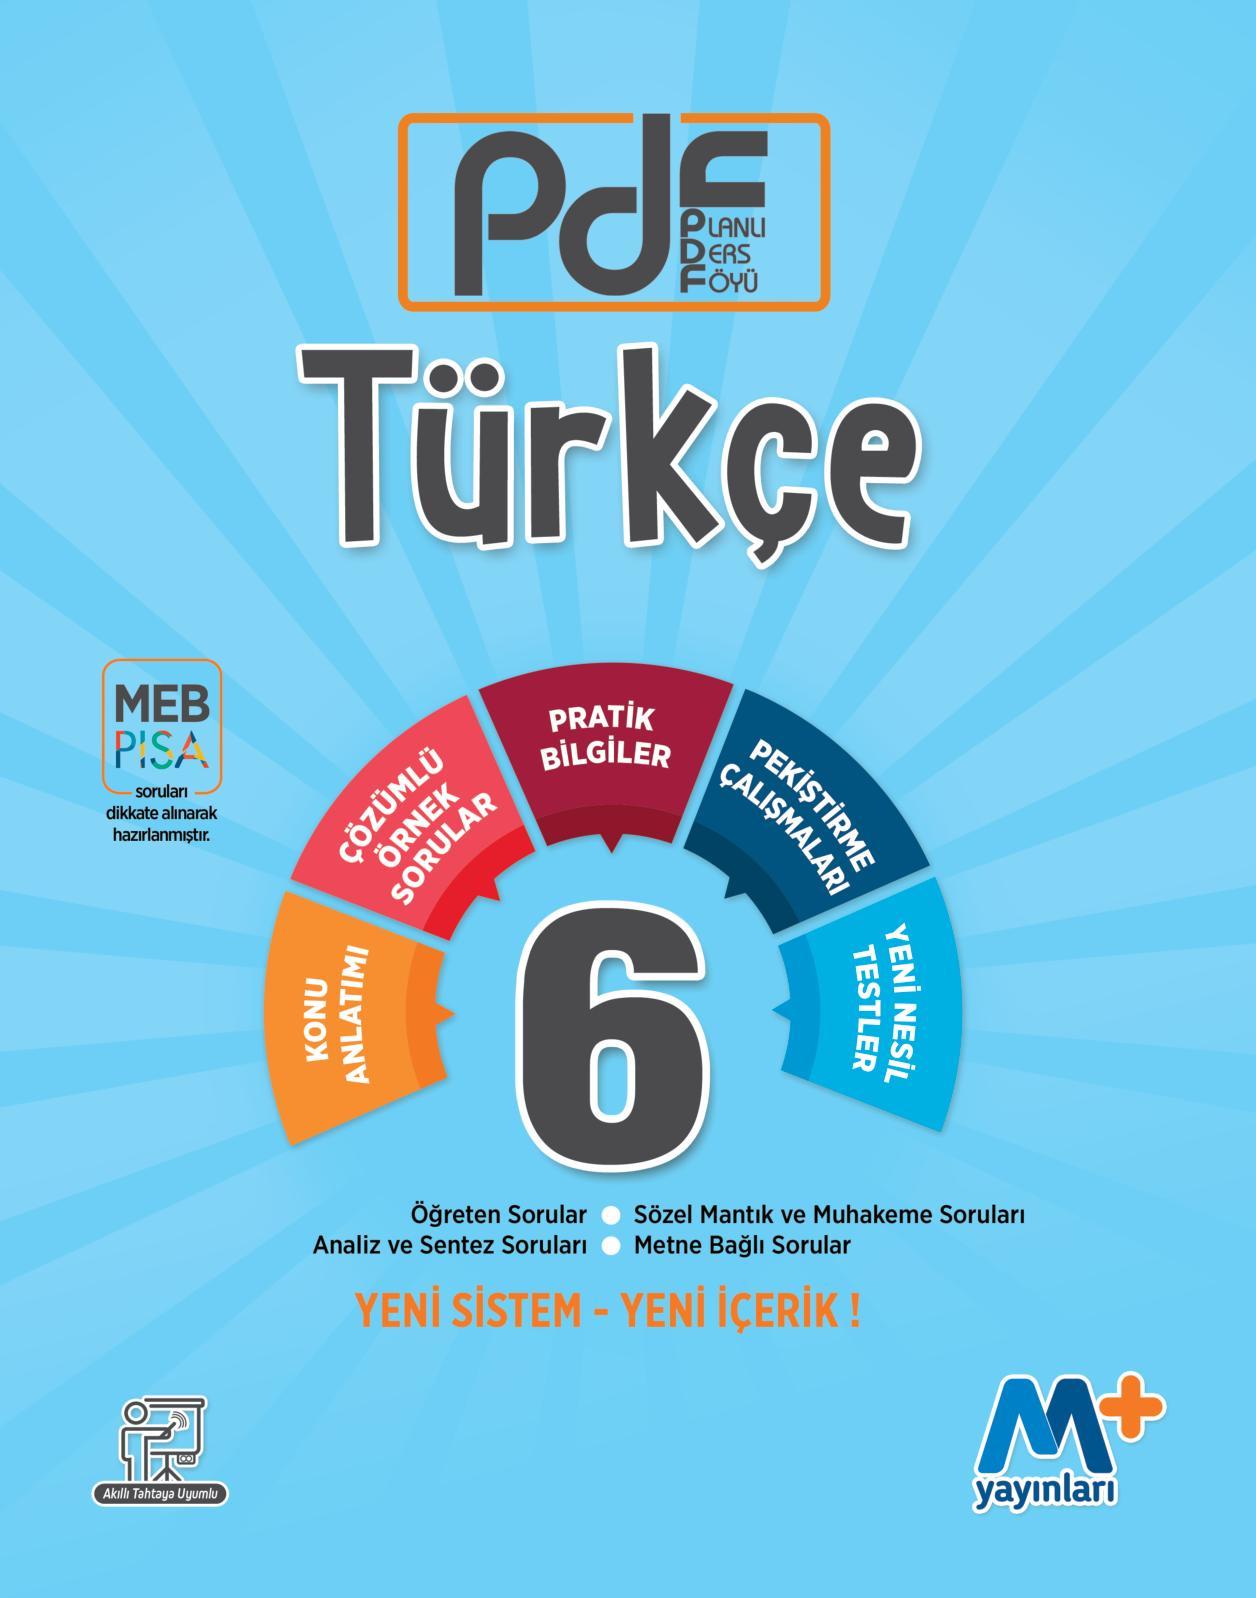 Calameo 6 Sinif Turkce Planli Ders Foyu